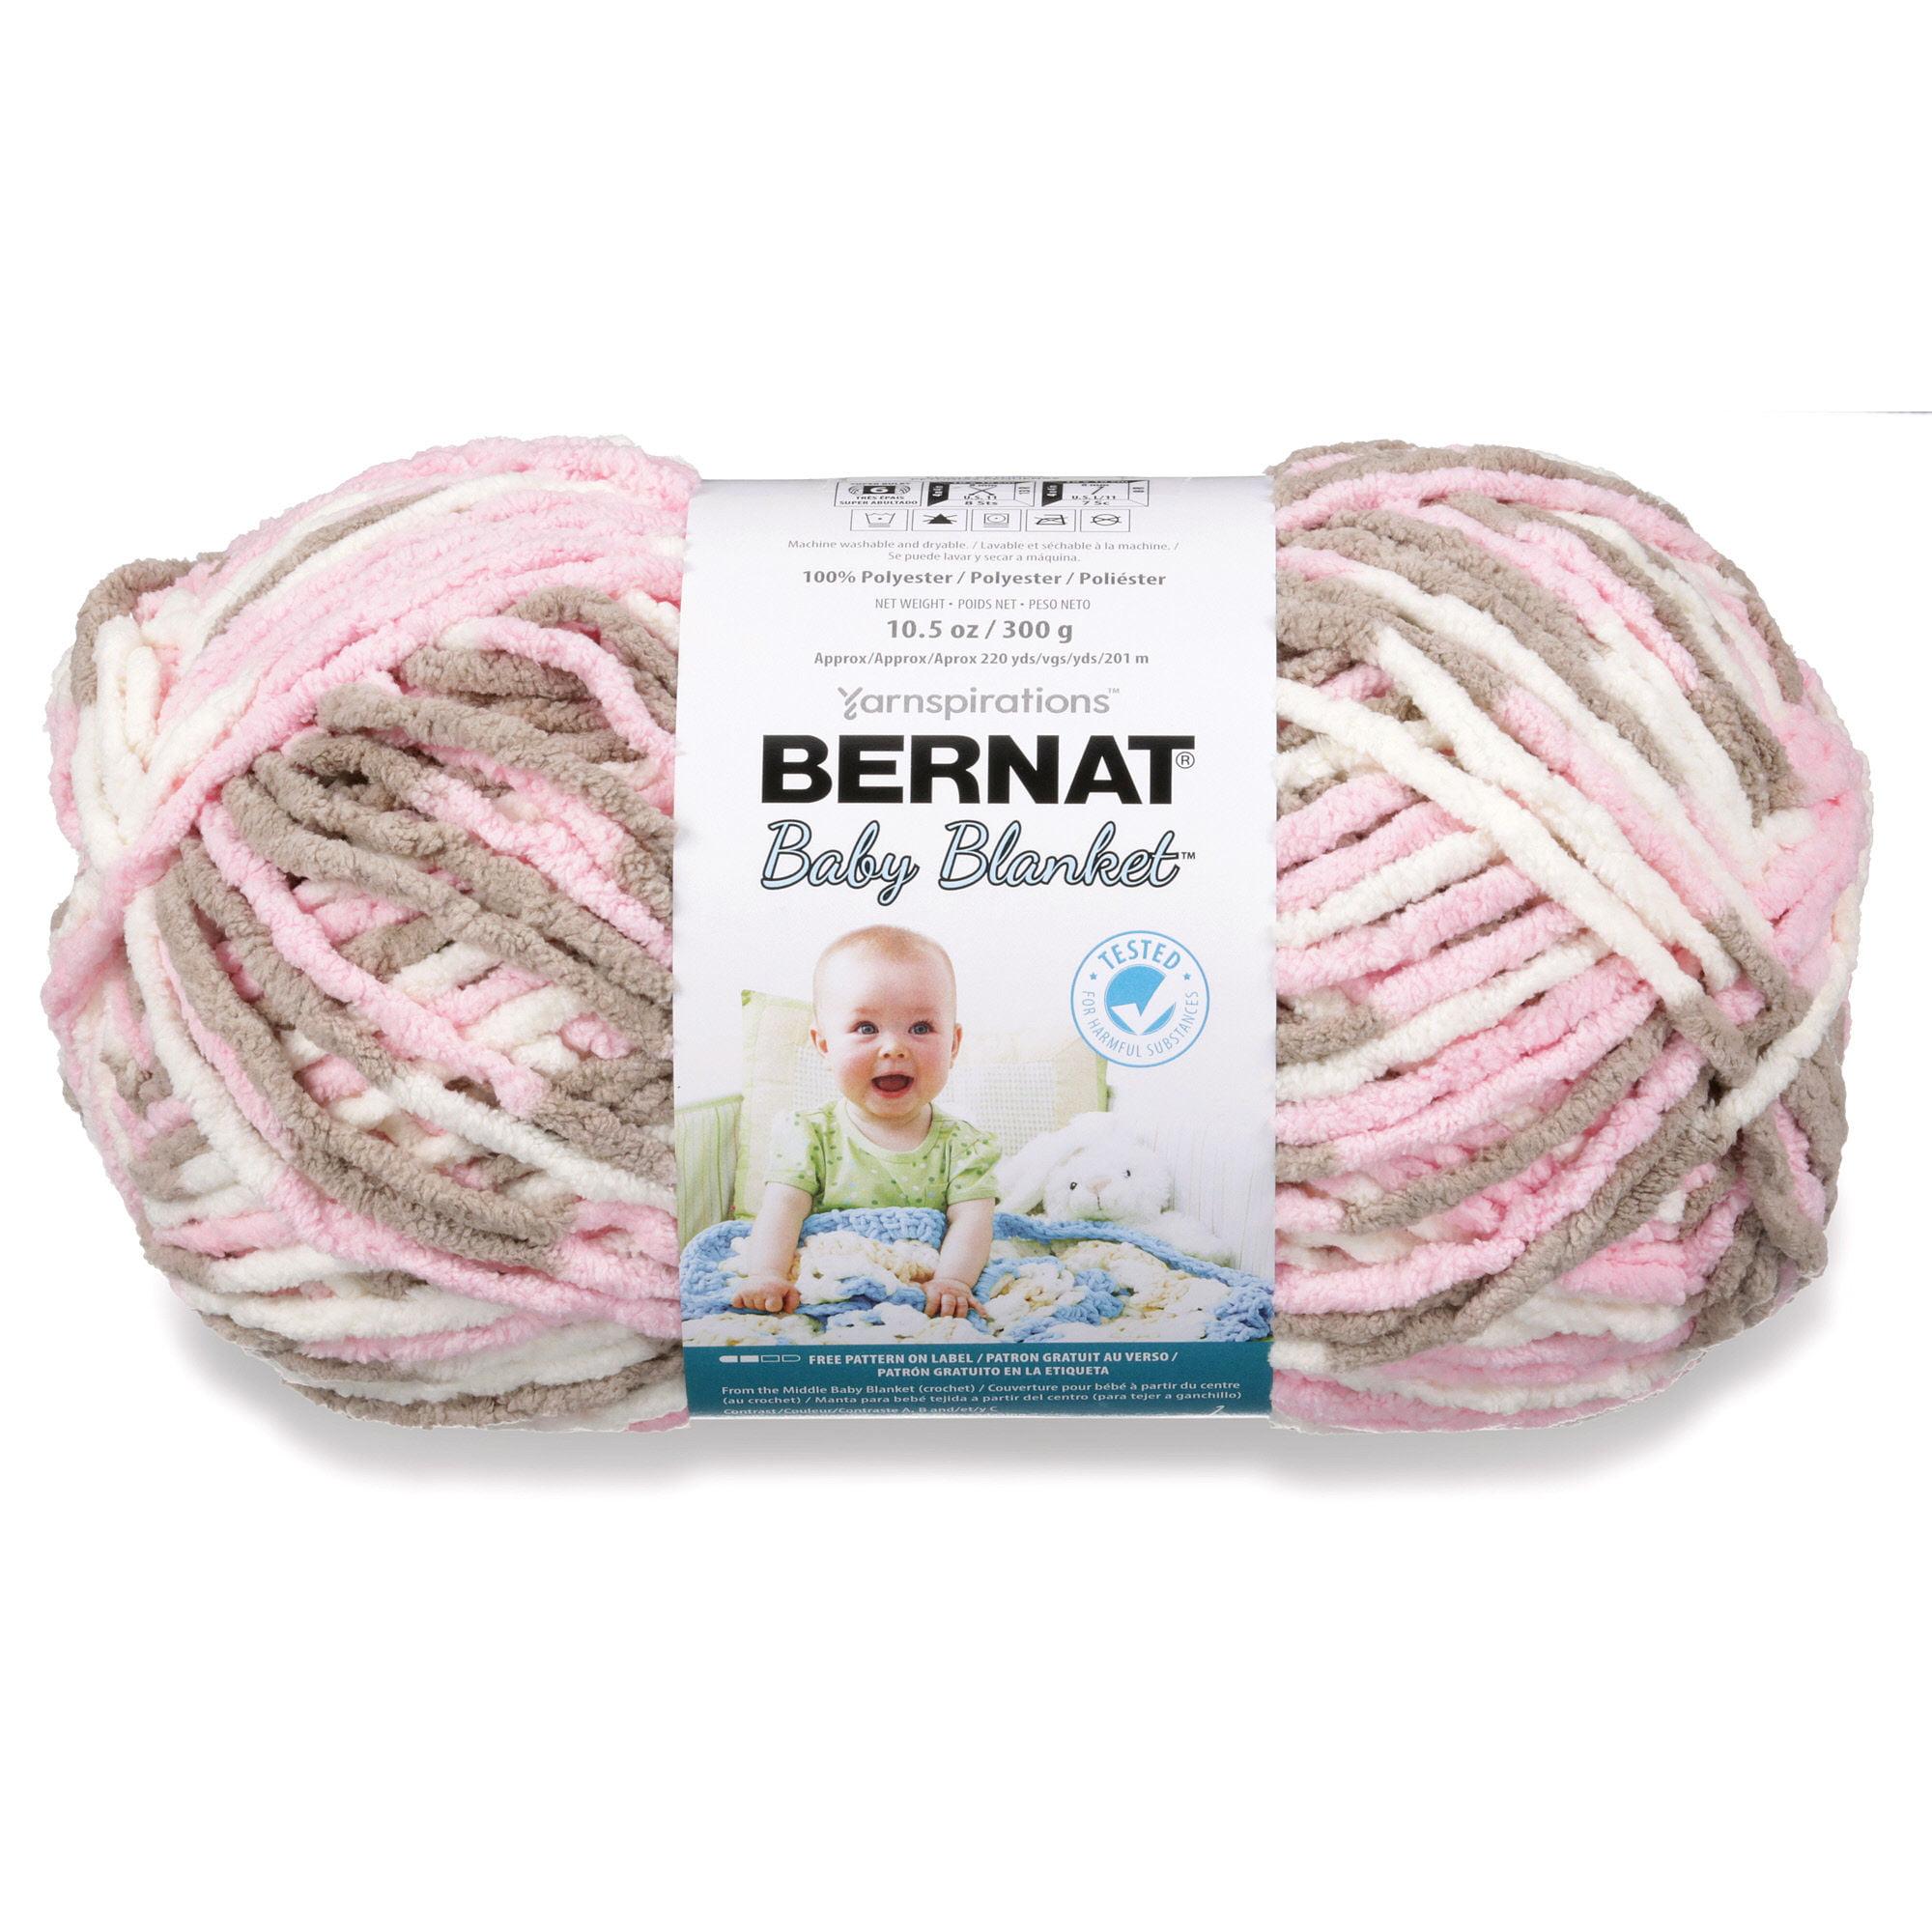 Bernat Baby Blanket Big Ball Yarn - Walmart.com